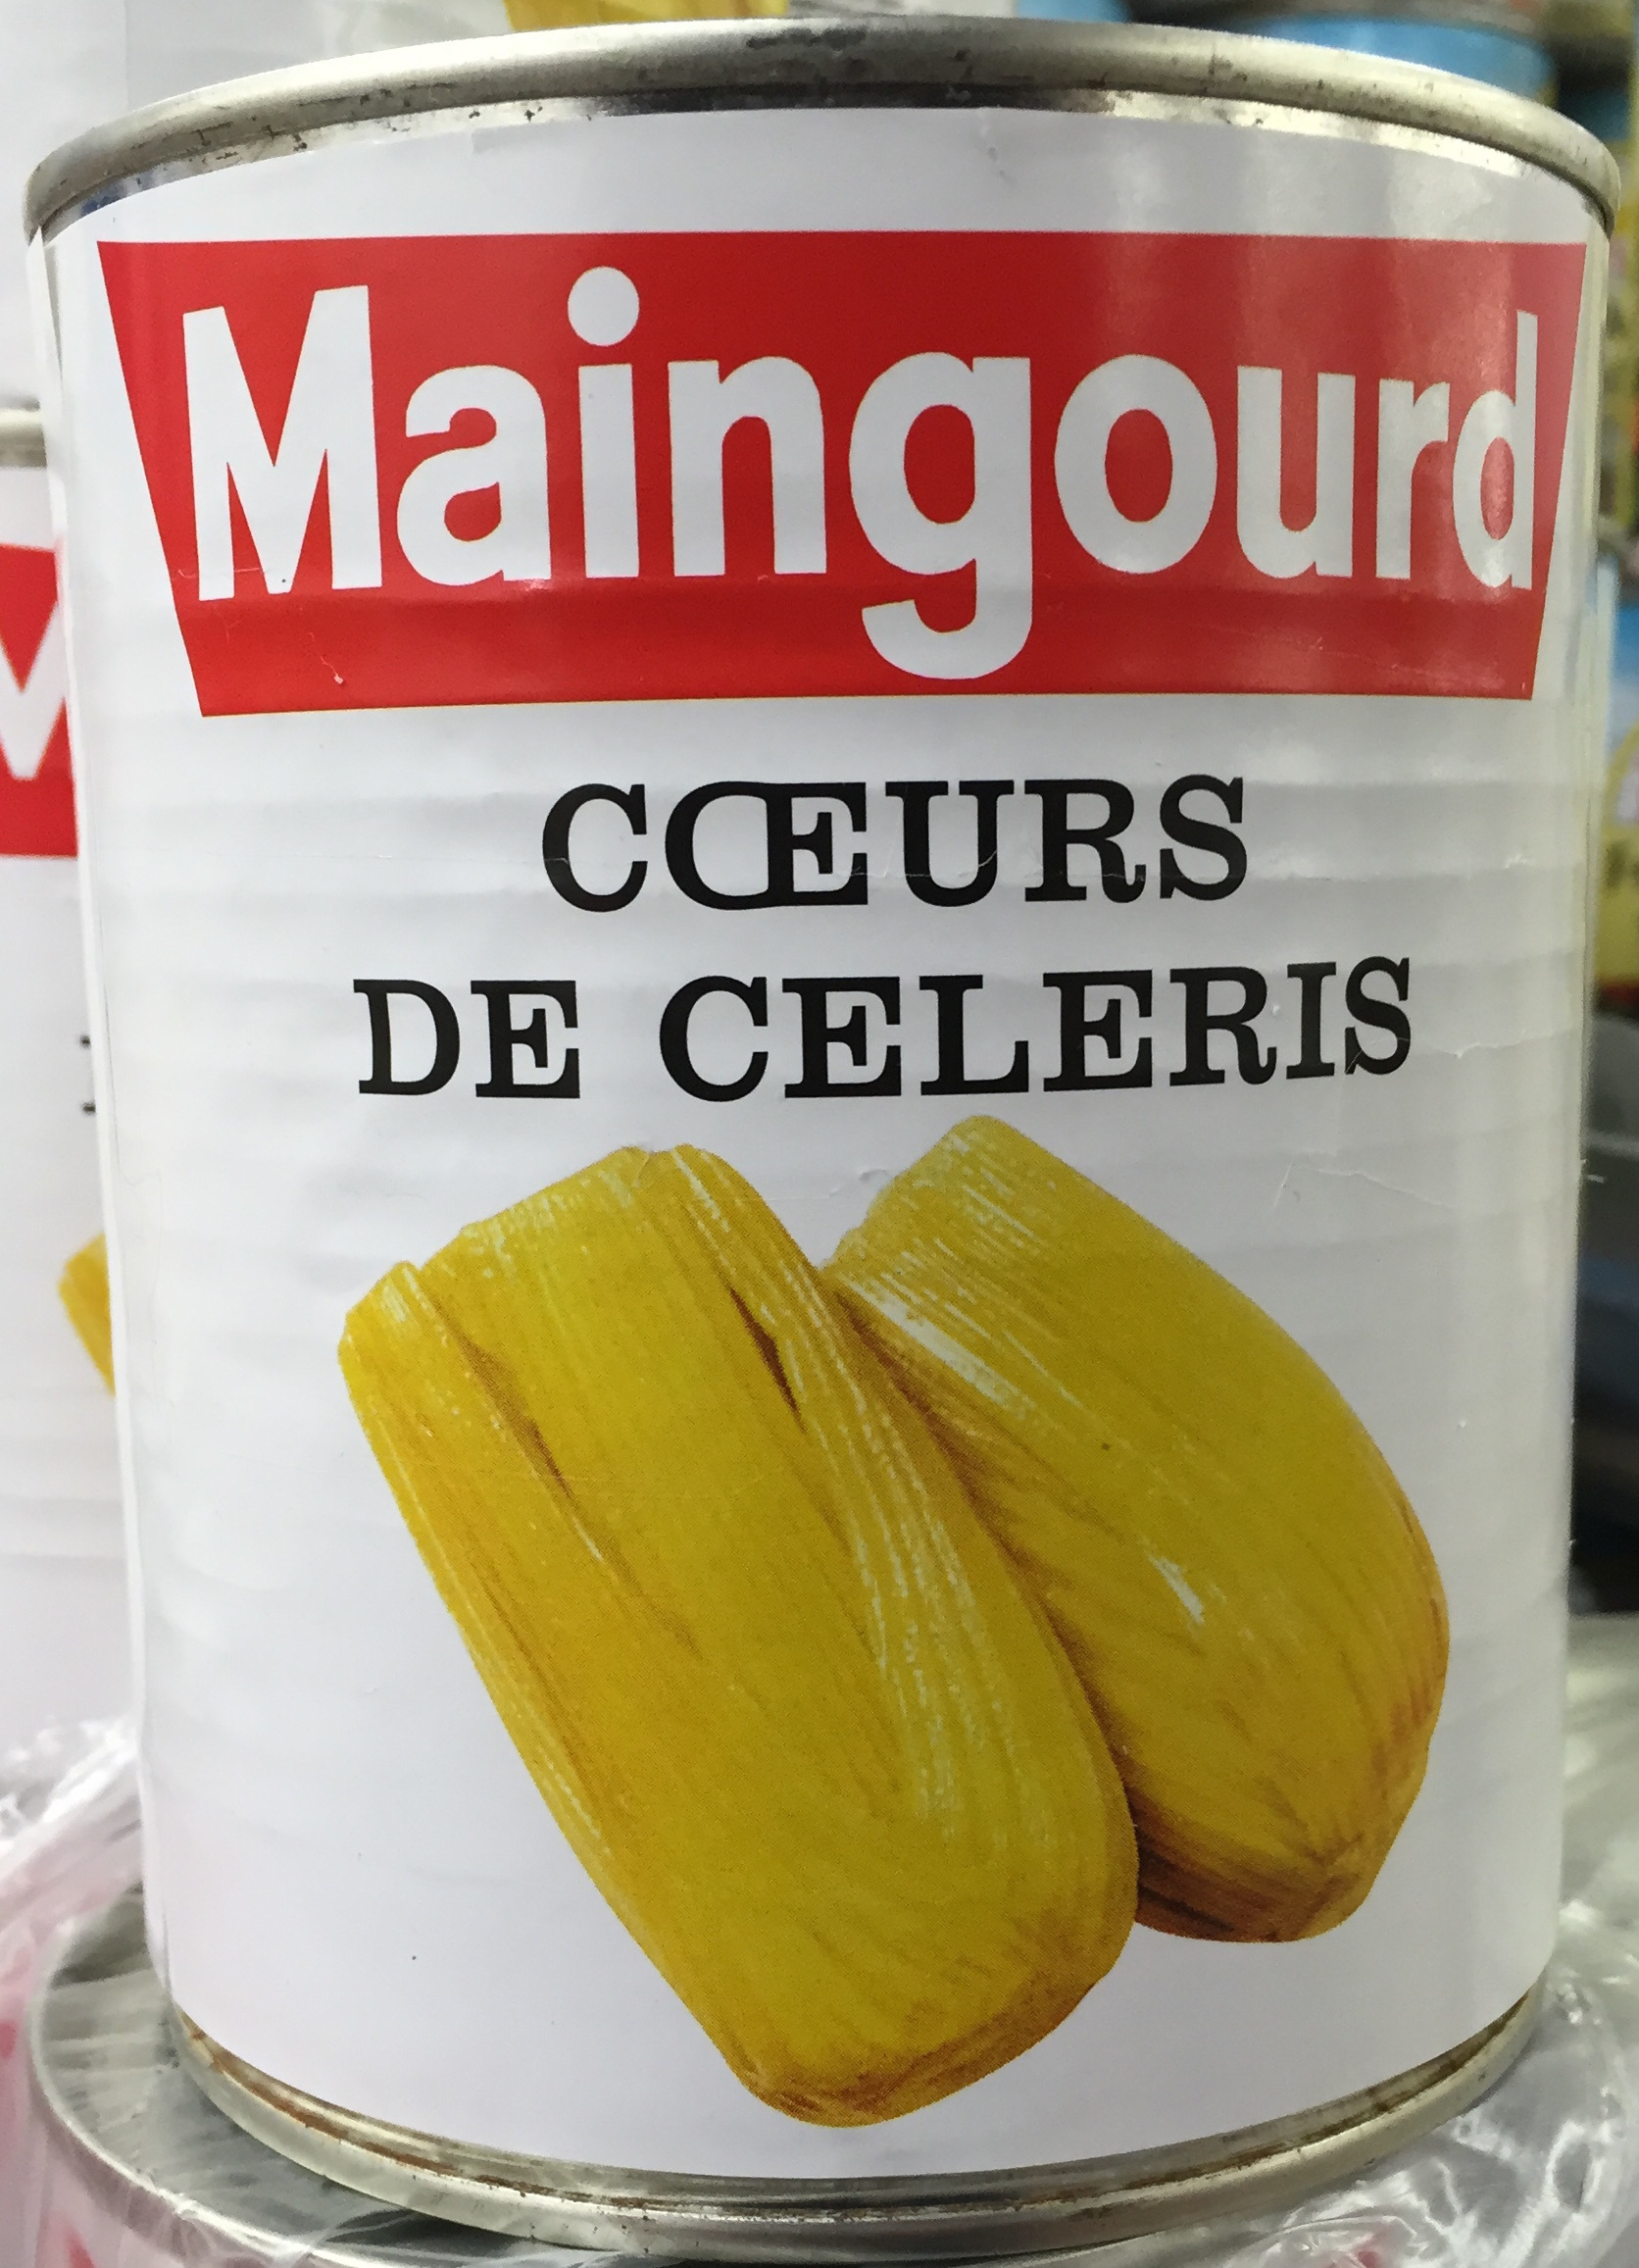 Cœurs de Céleris - Product